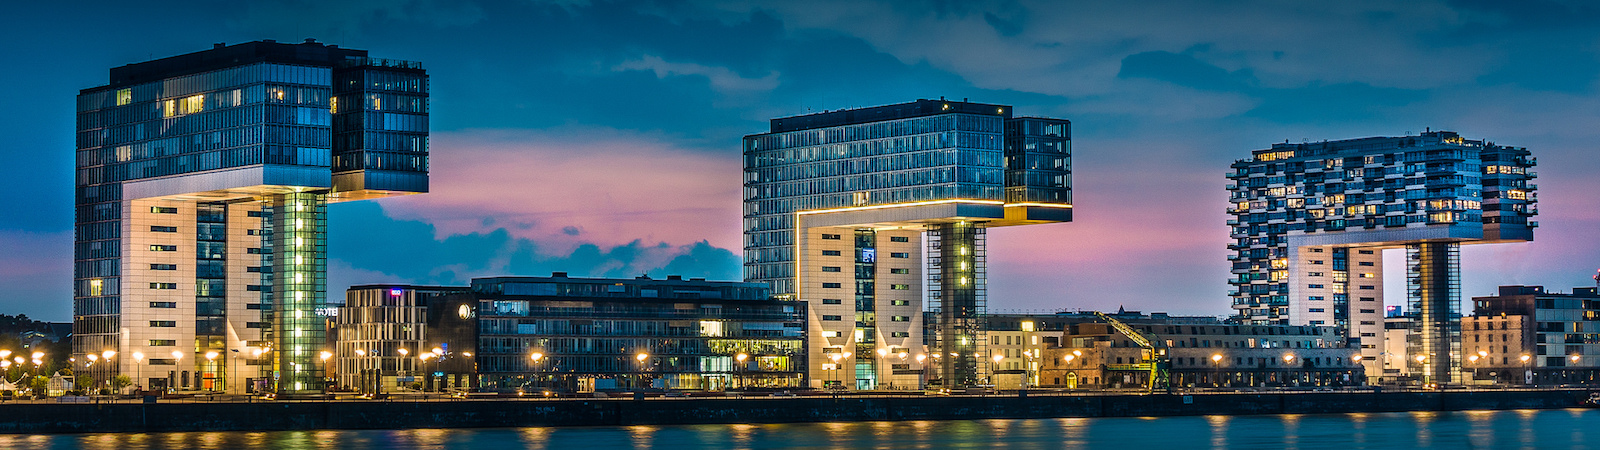 Köln Stadtansicht